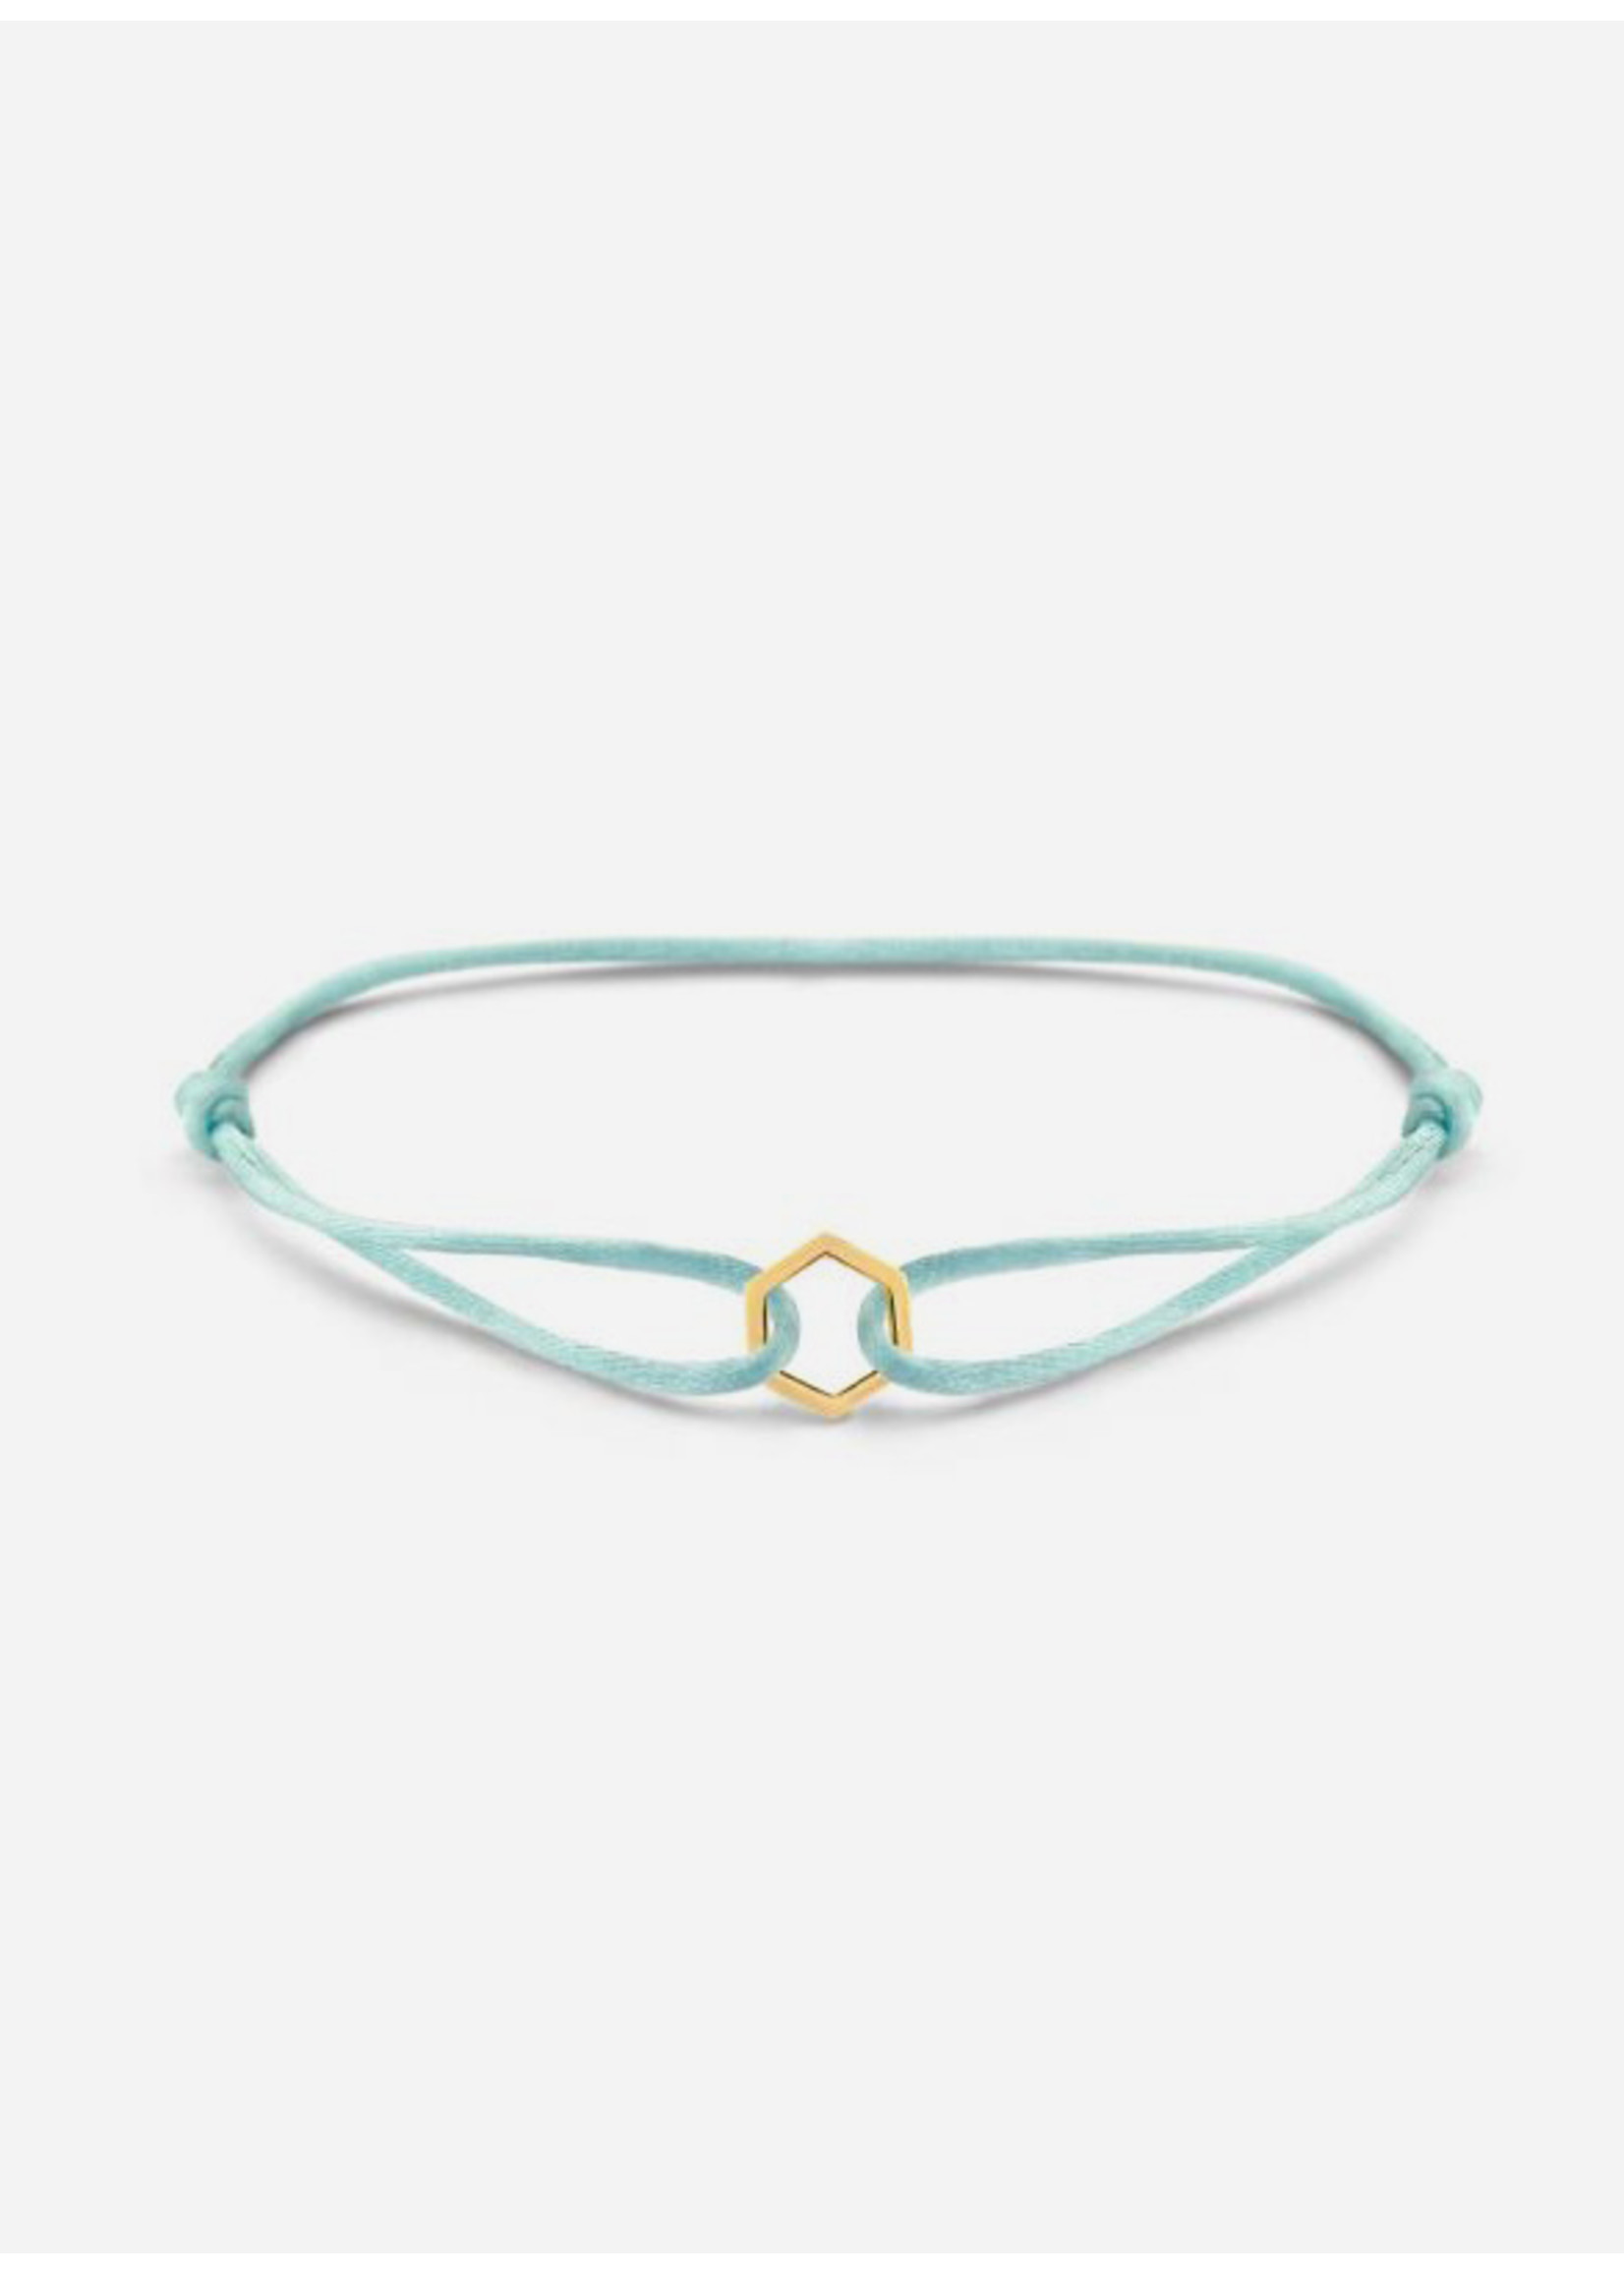 Just Franky Iconic bracelet hexagon cord